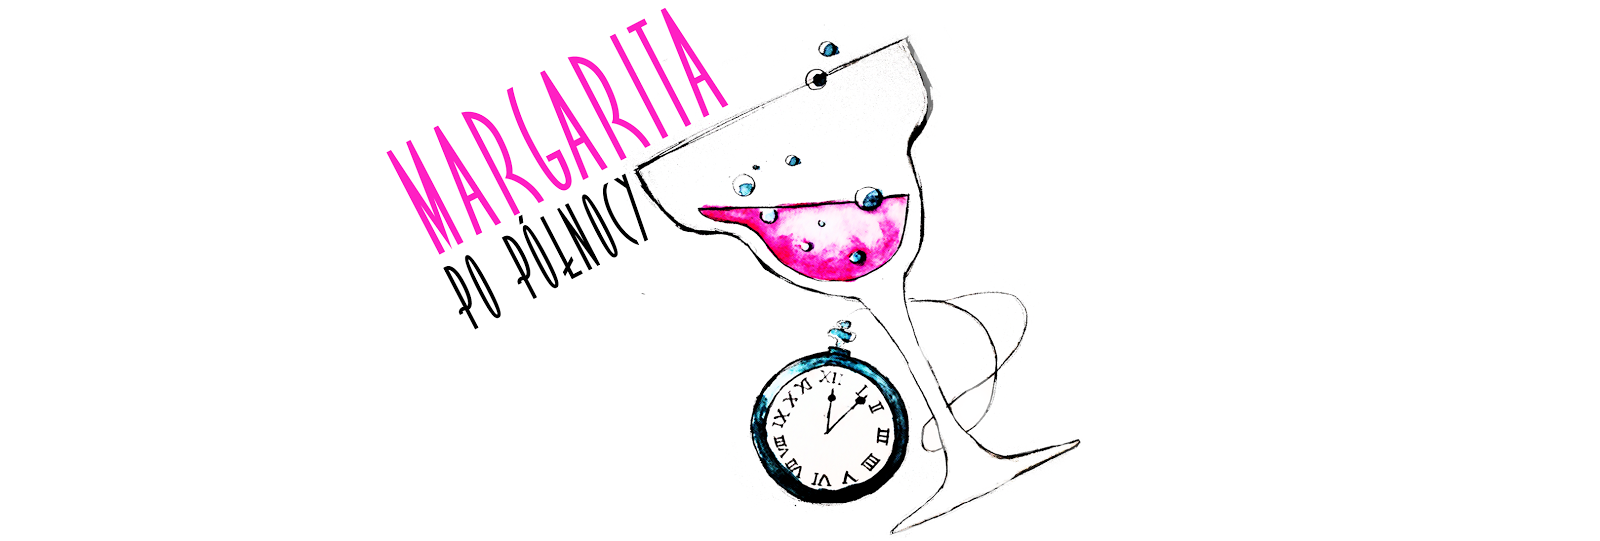 Margarita po północy